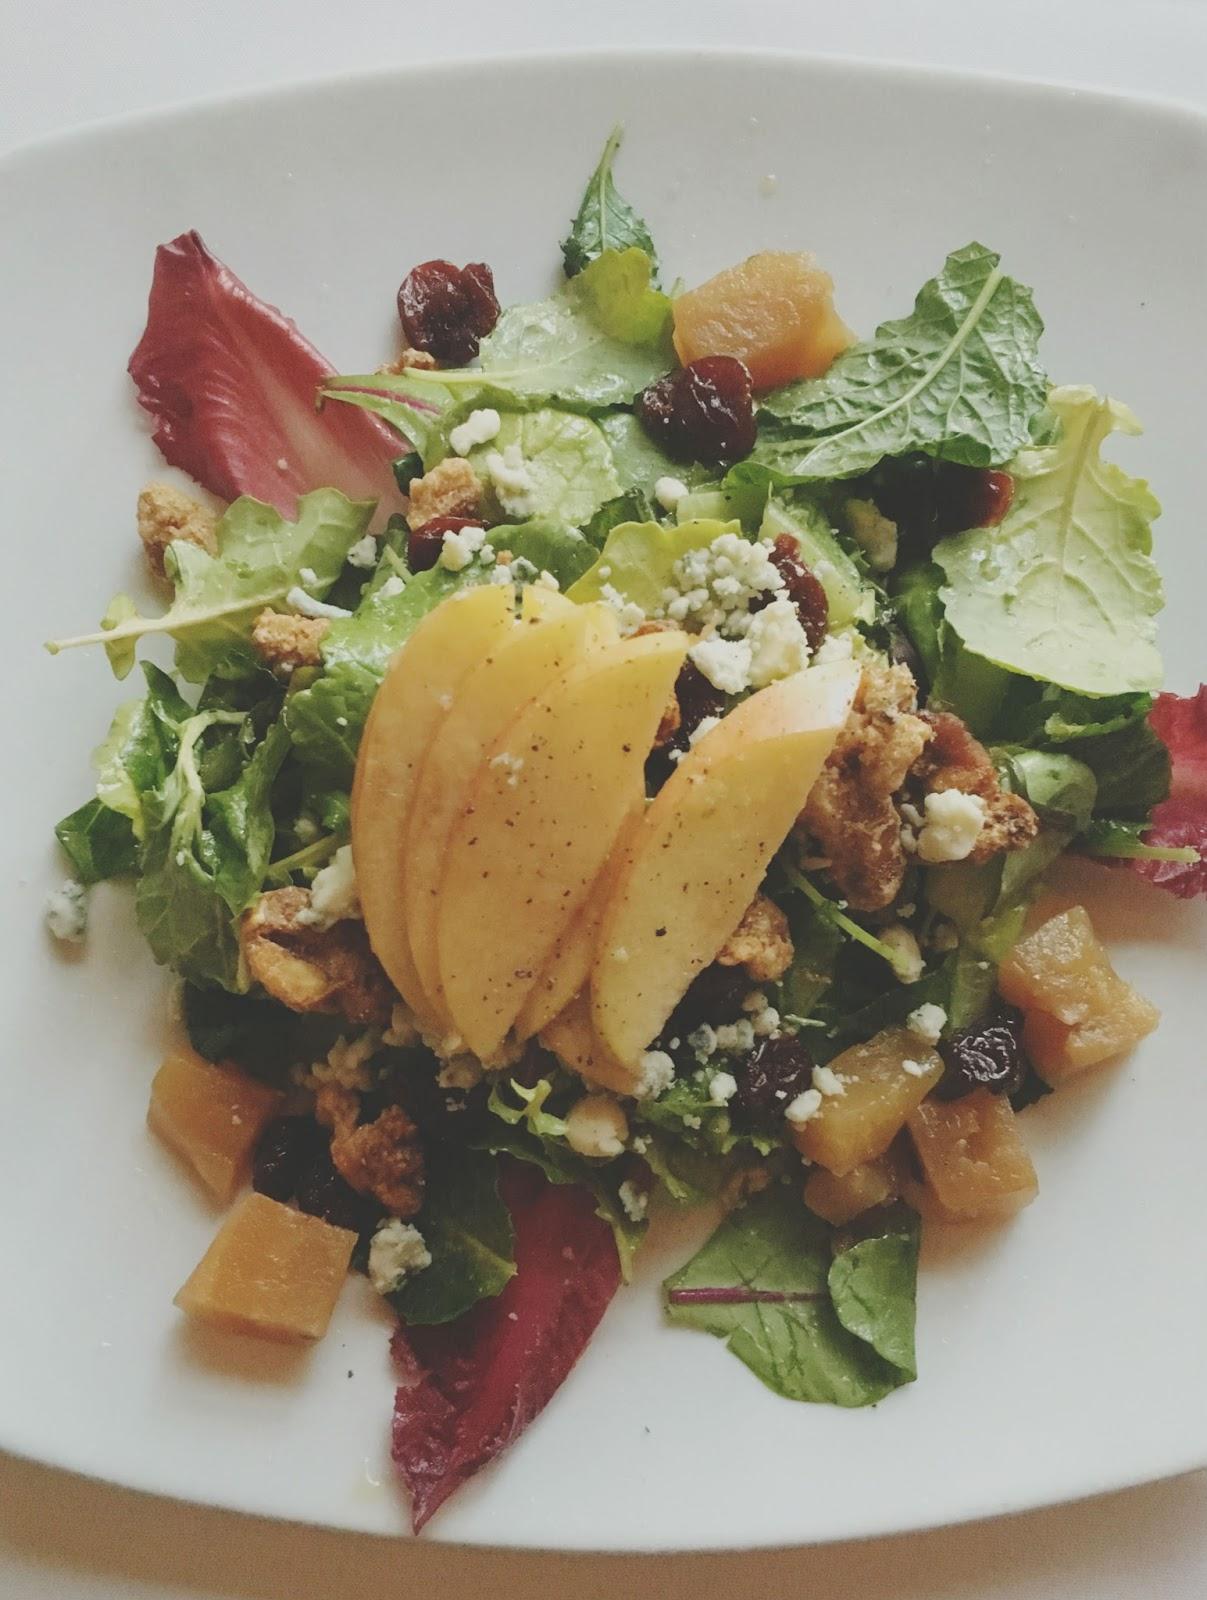 salad at Eddie V's - A restaurant in Houston, Texas